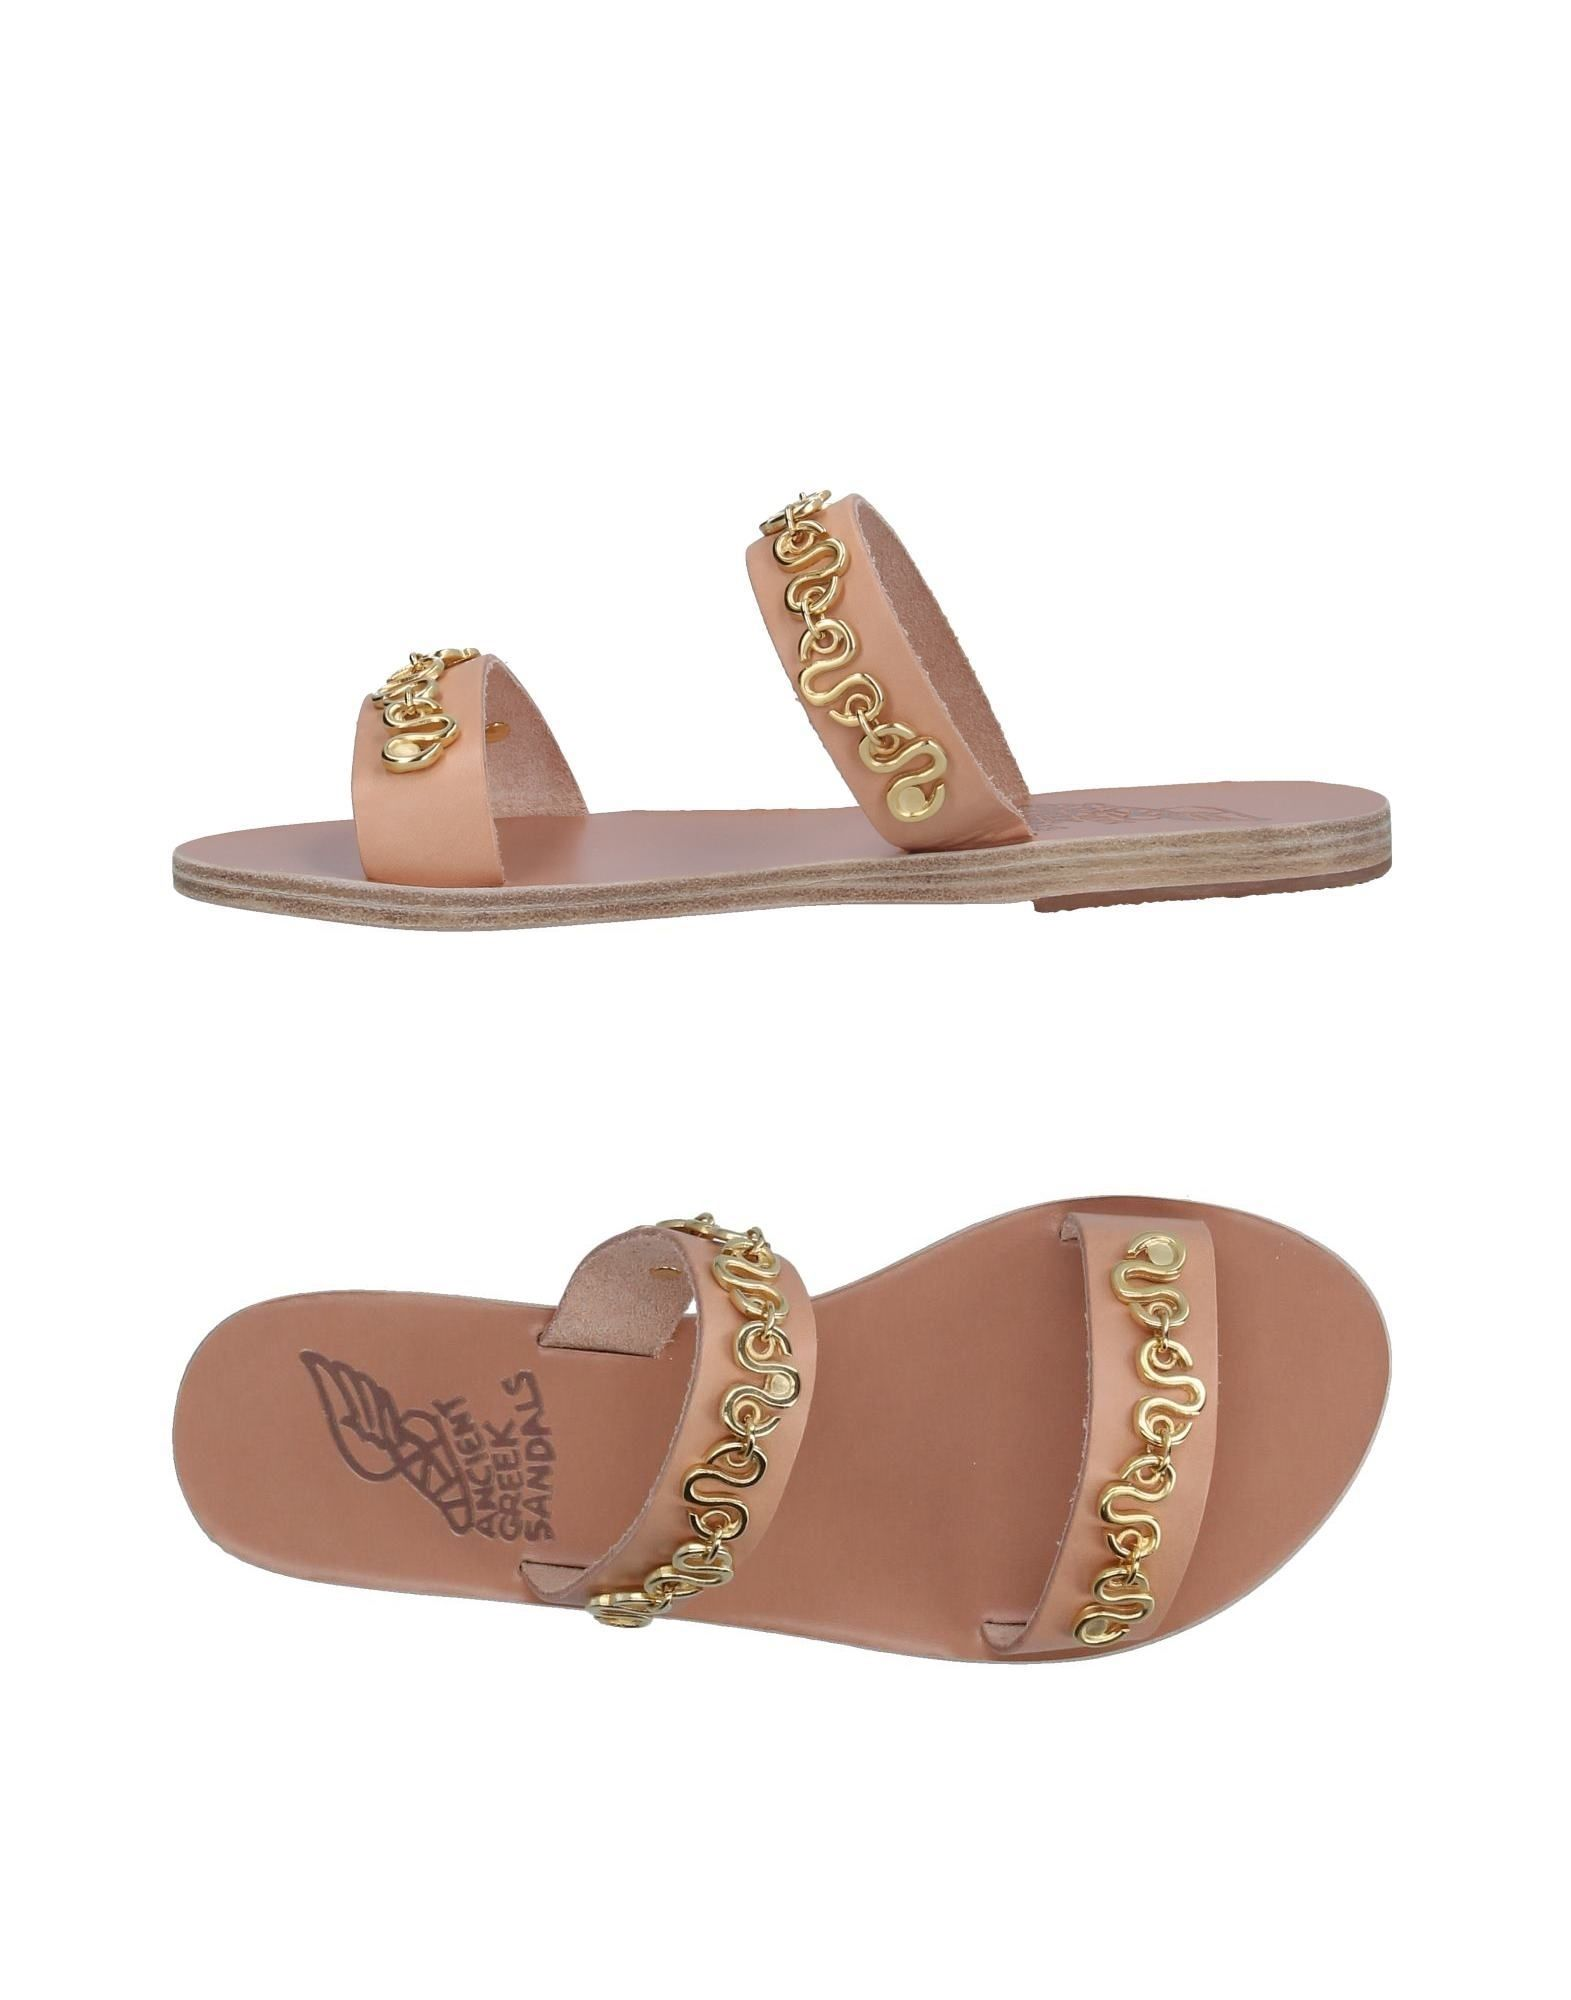 ANCIENT GREEK SANDALS Сандалии woman high heels sandals gold chains sandals lady high heels sandals sexy open toe pumps cut outs dress nightclub shoes b160